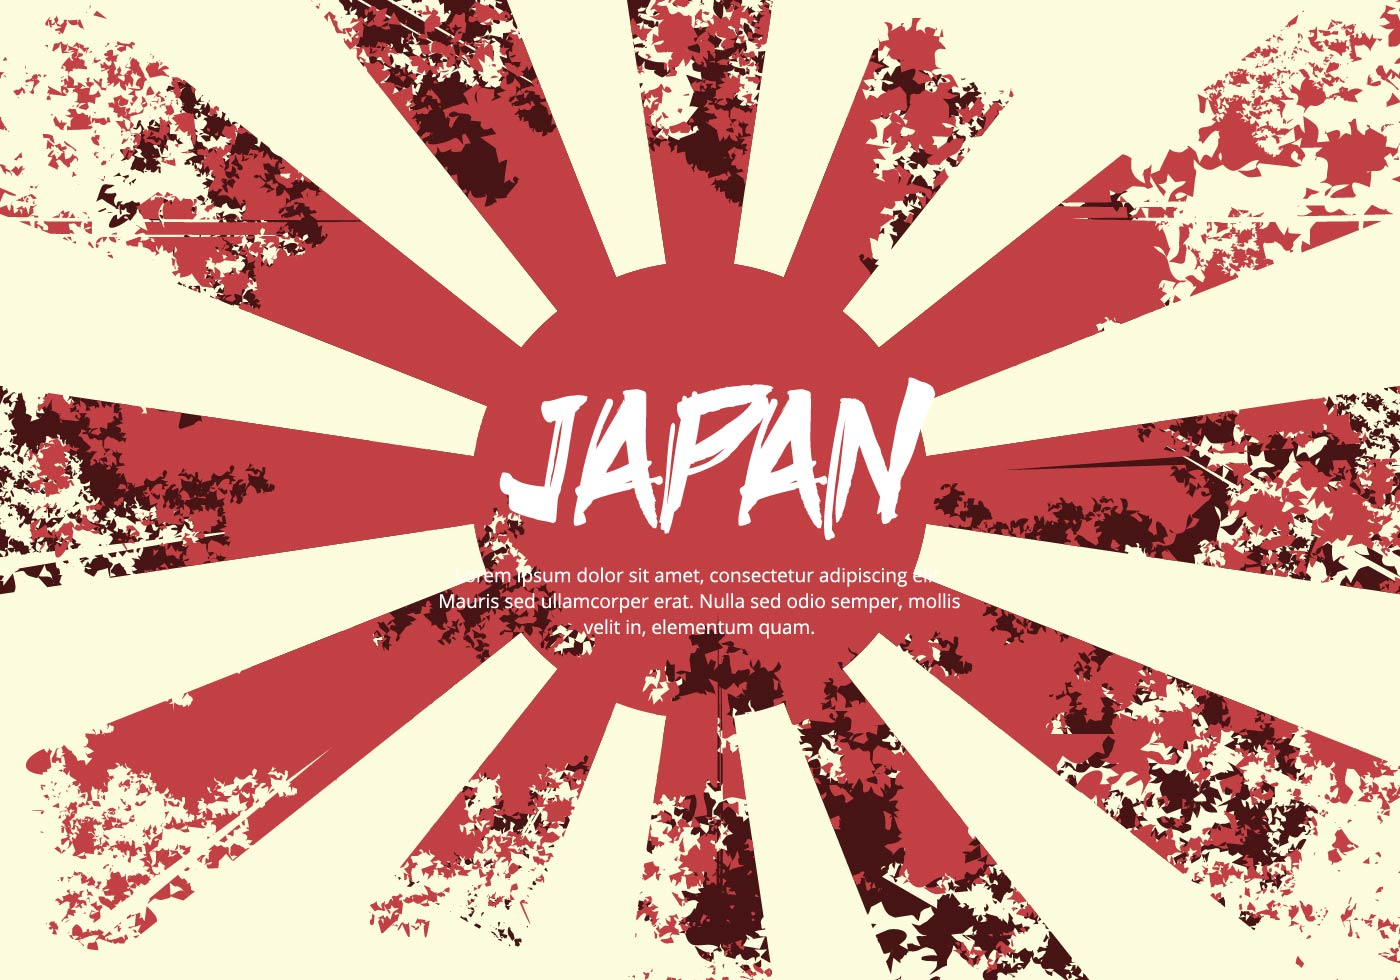 Kamikaze Free Vector Art - (1220 Free Downloads)